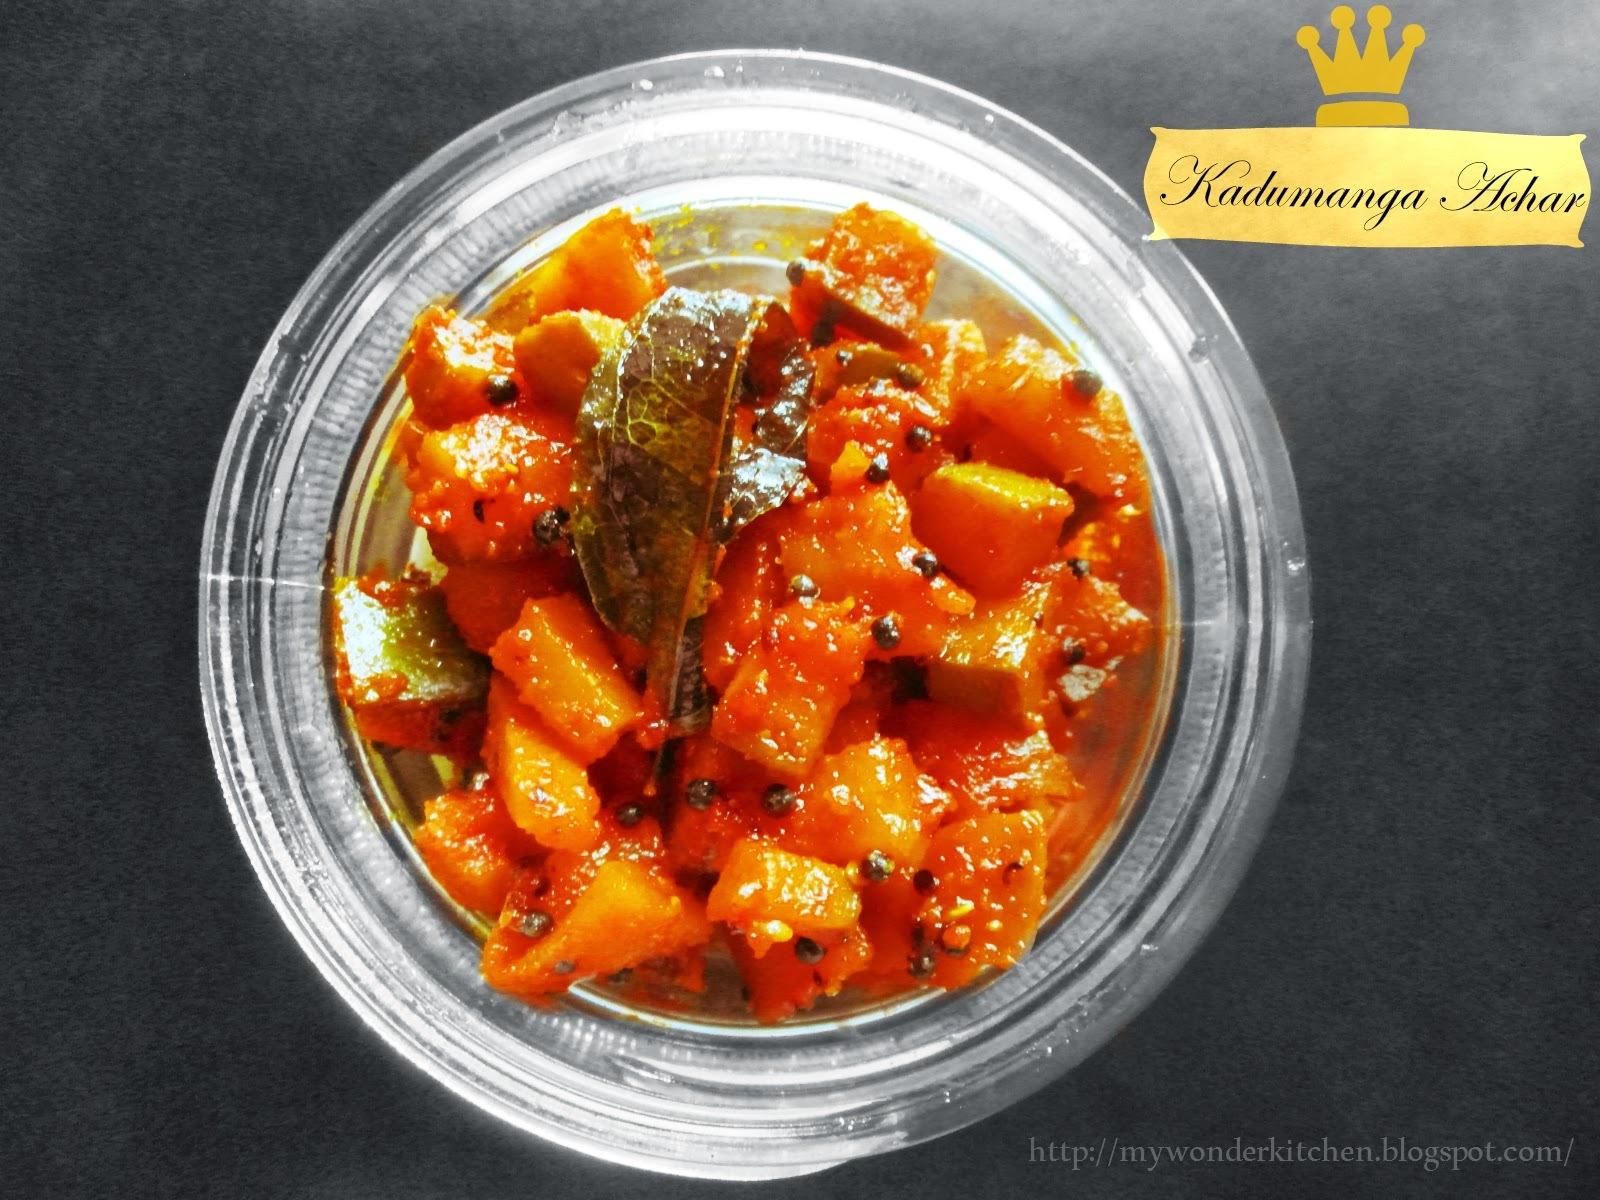 Amma's Kadumanga Achar|Kerala Mango pickle